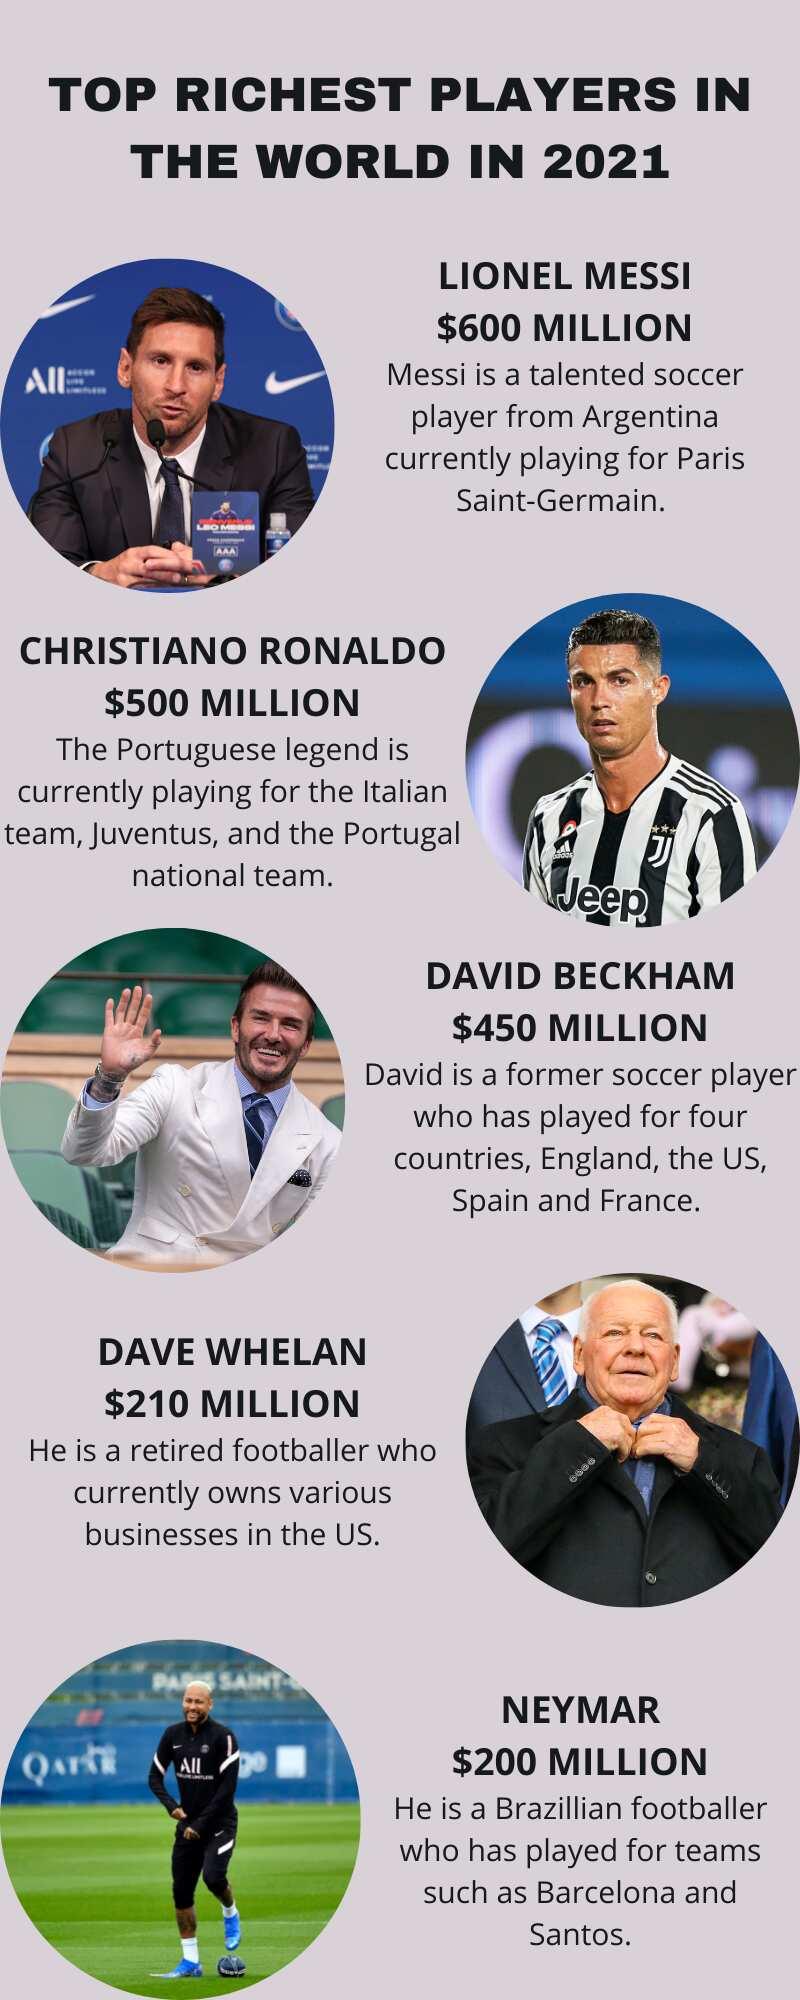 Top 20 des footballeurs les plus riches du monde en 2021 et leur valeur nette: Pogba 10e, Eto'o 15e, Drogba 17e...